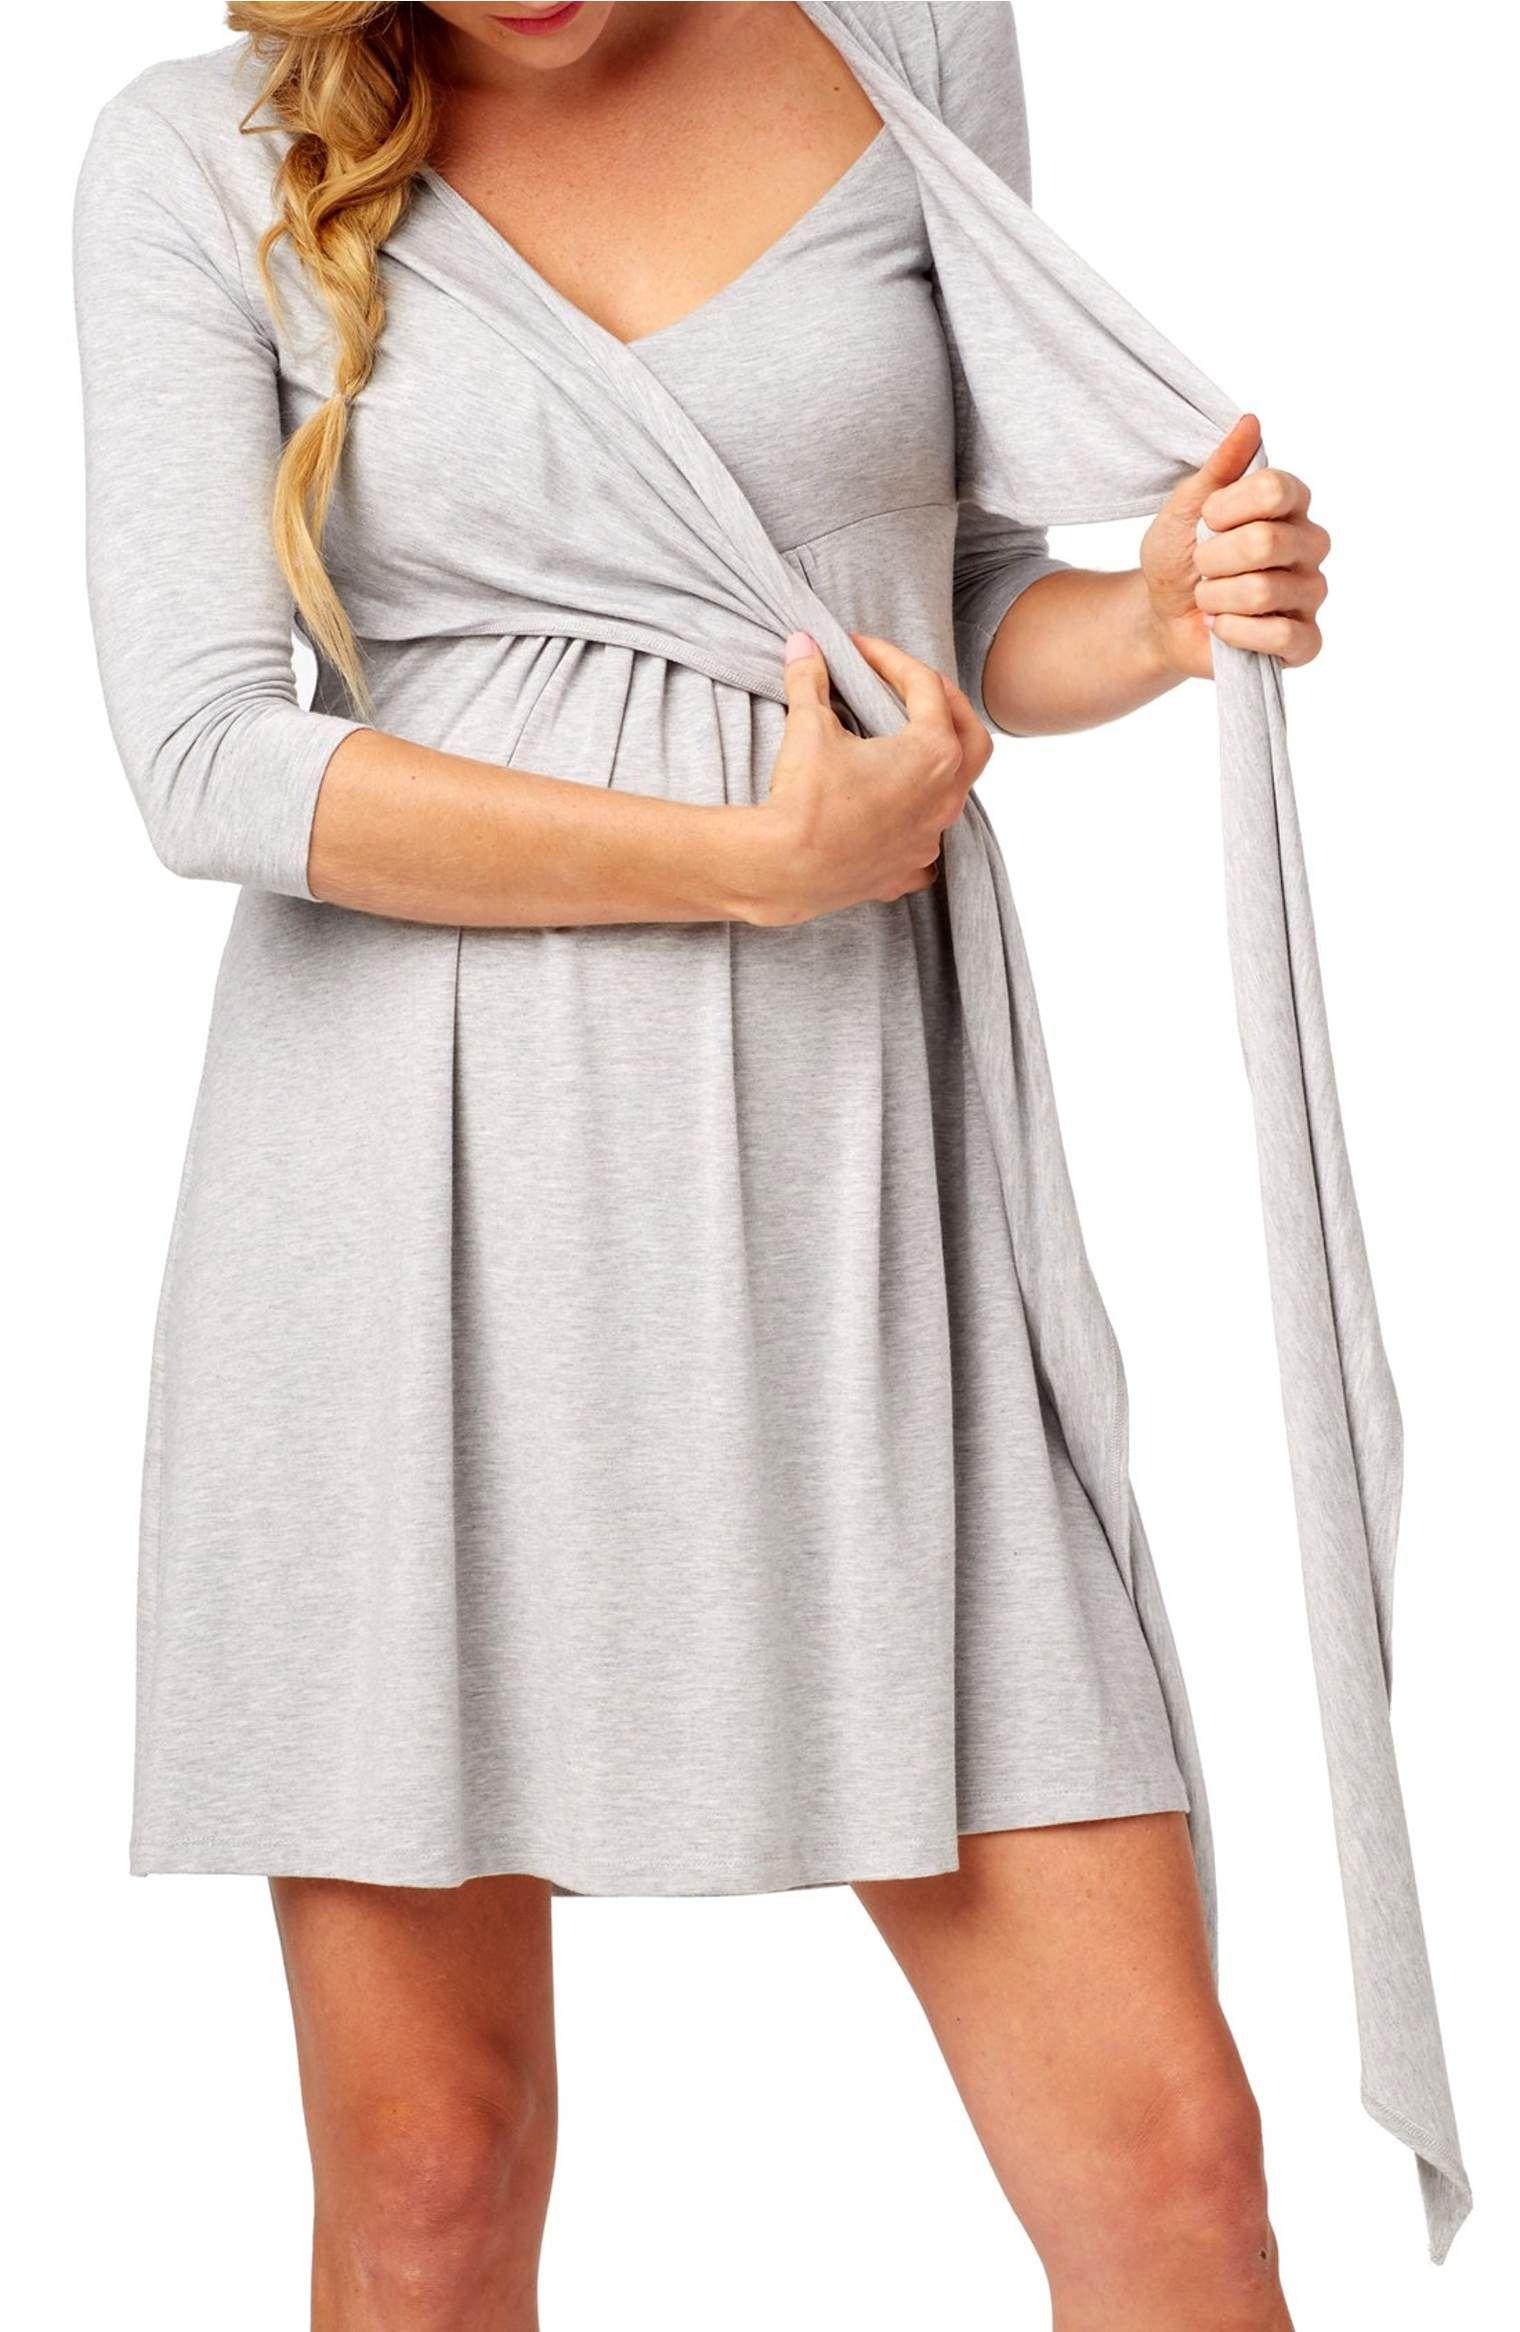 c9e7e435026 Main Image - Rosie Pope Maternity Nursing Wrap Dress